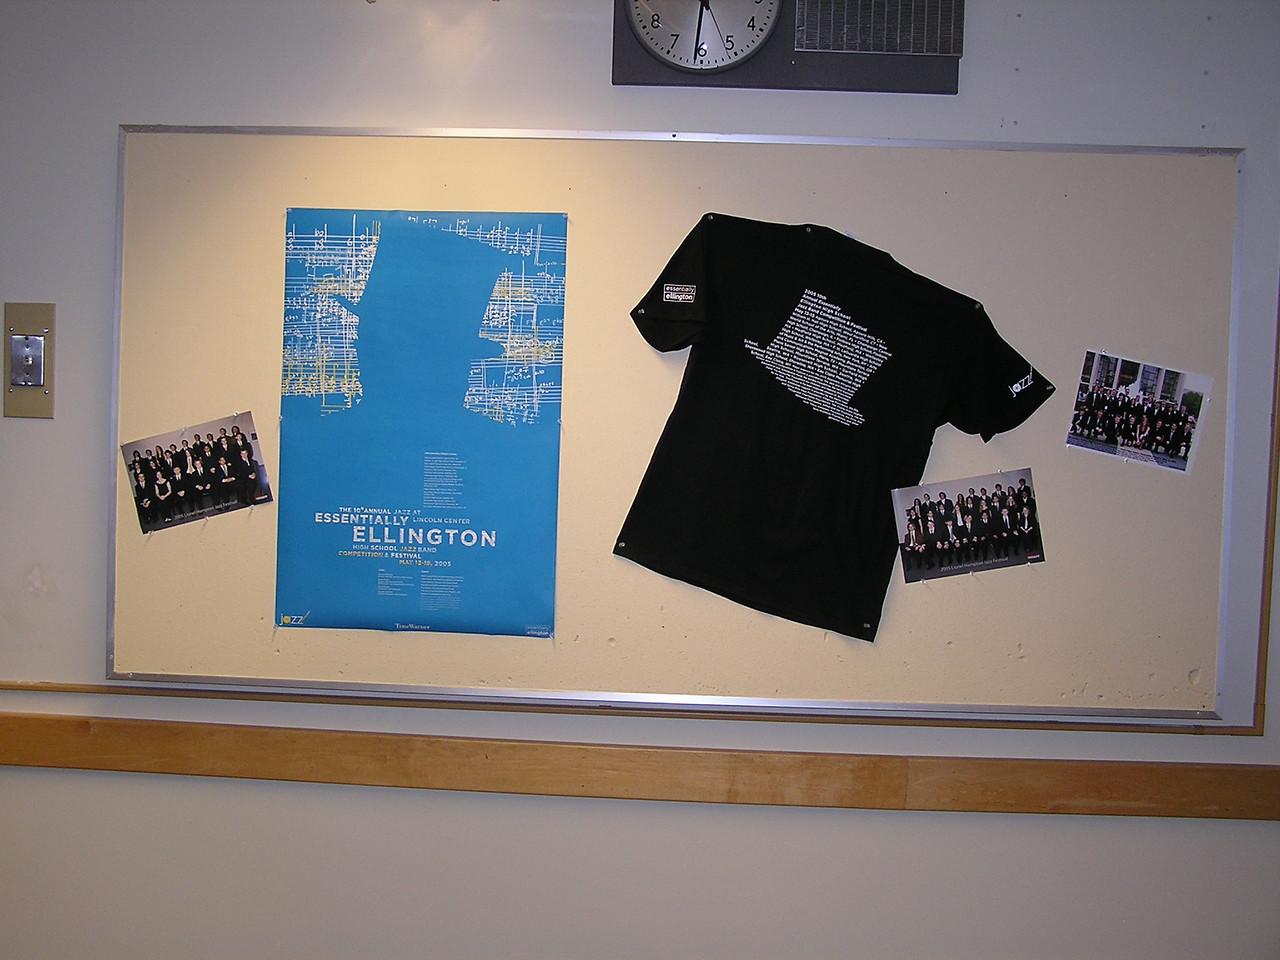 Essentially Ellington Jazz Festival memorabilia.  Blue poster and black tee-shirt.